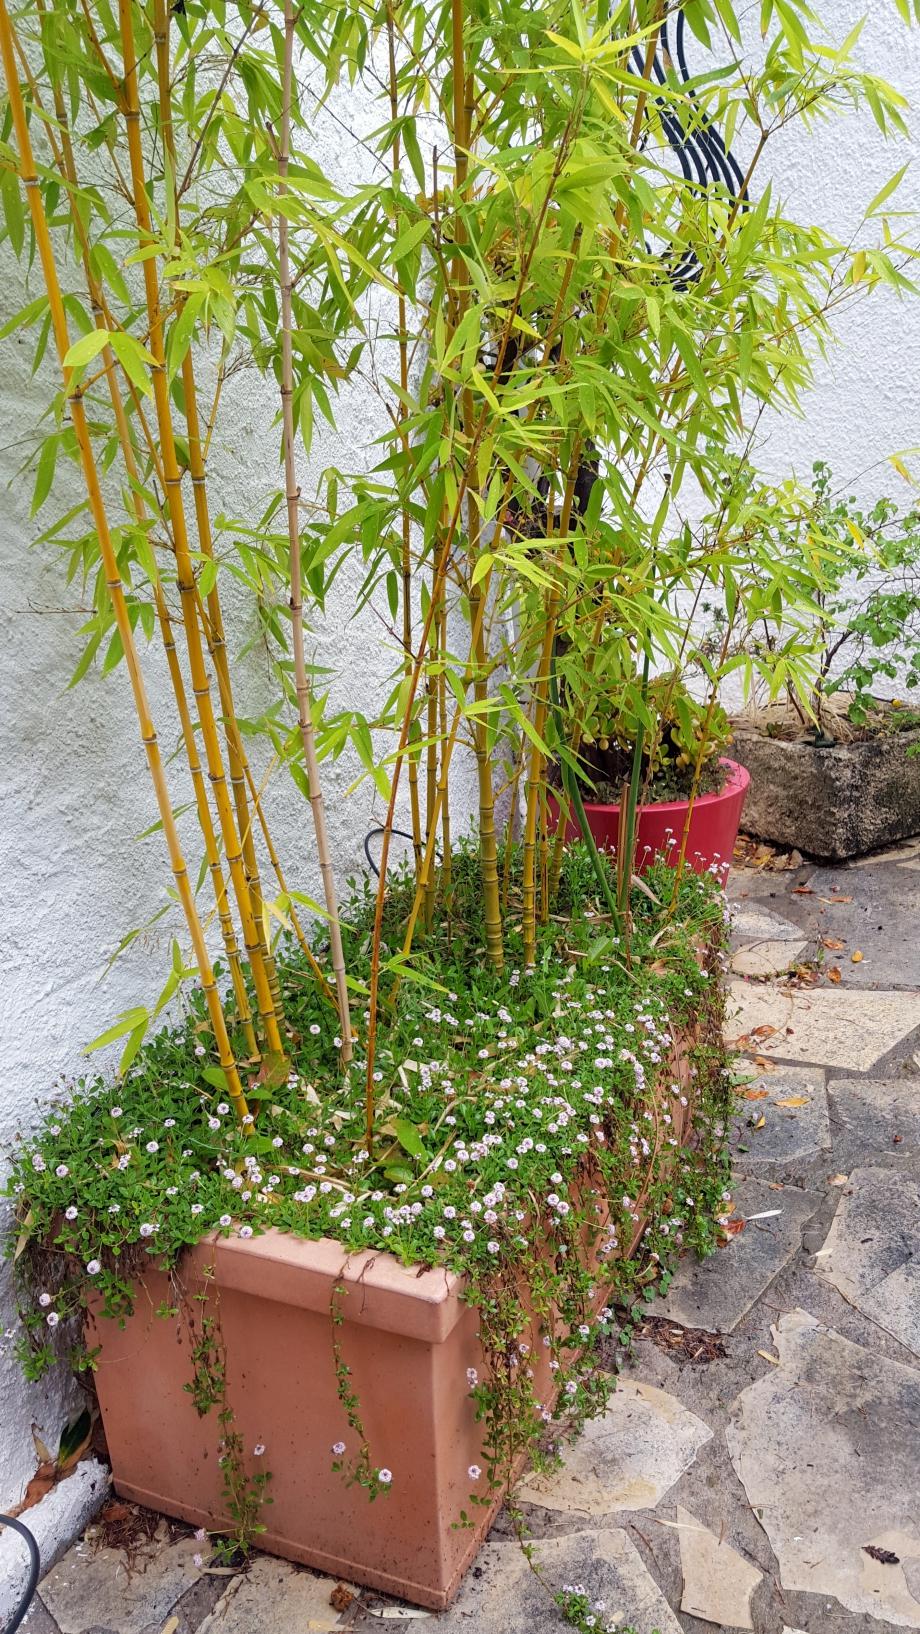 Pelouse fleurie dans jardinière 19 juin 16.jpg